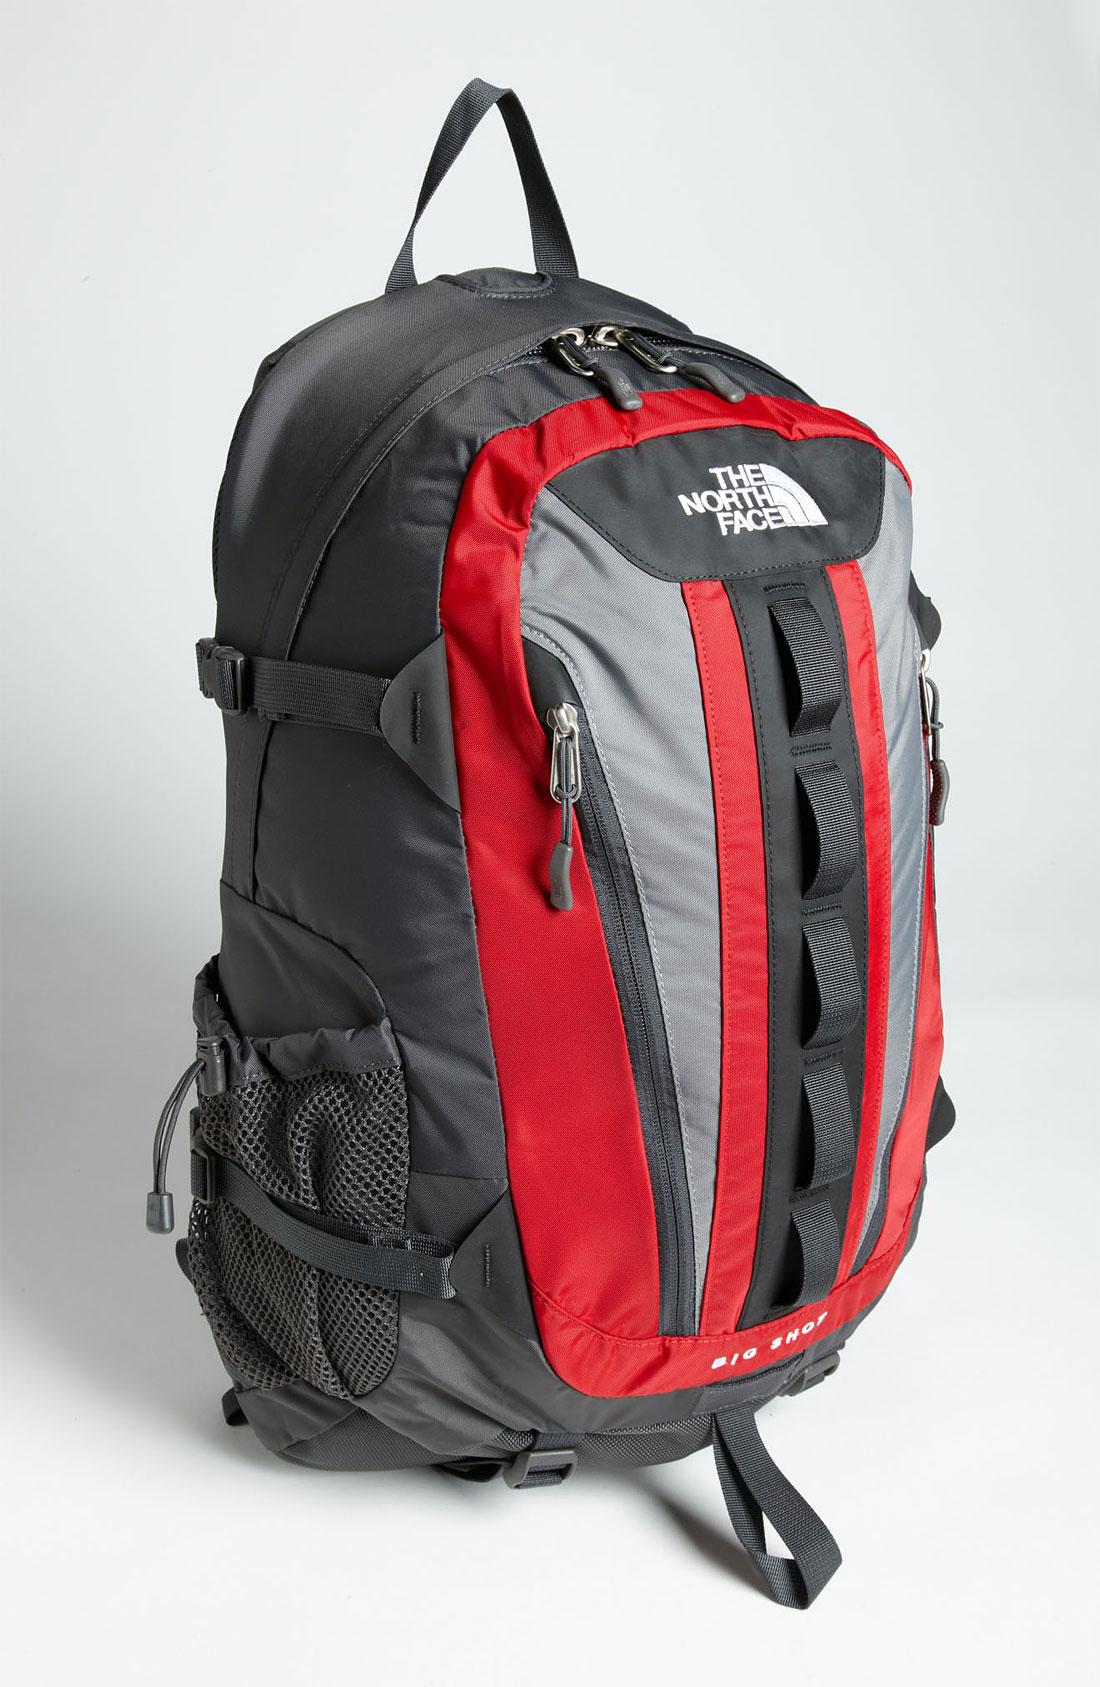 e3ea1fb5f The North Face Unisex Hot Shot Black Laptop Backpack - CEAGESP